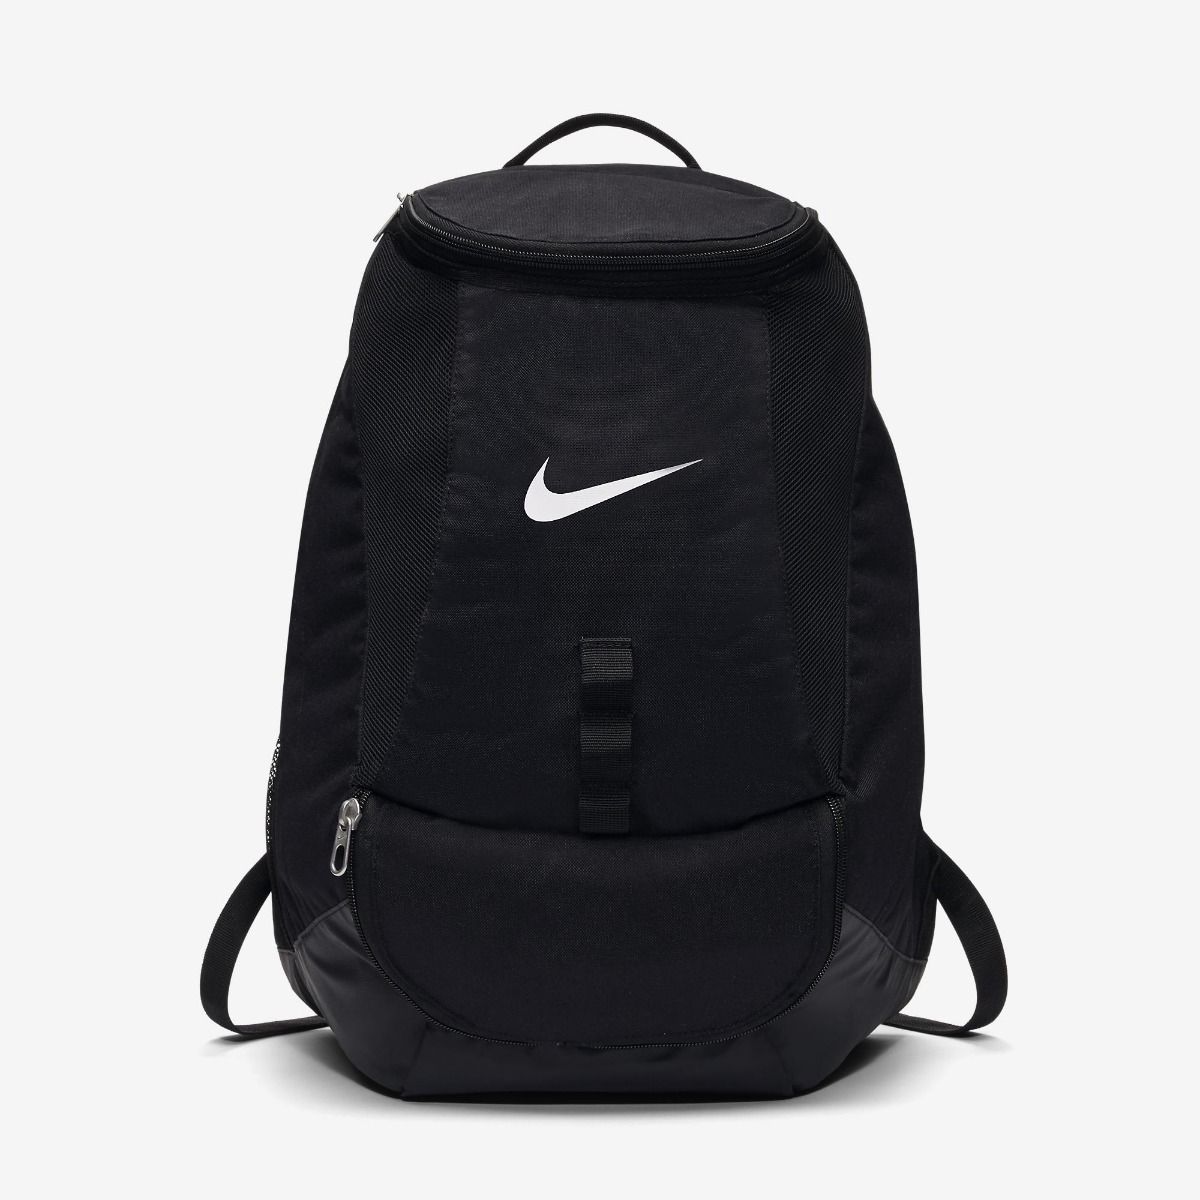 mochila nike club team swoosh backpack futebol preta. Carregando zoom. d05838b6b27bb